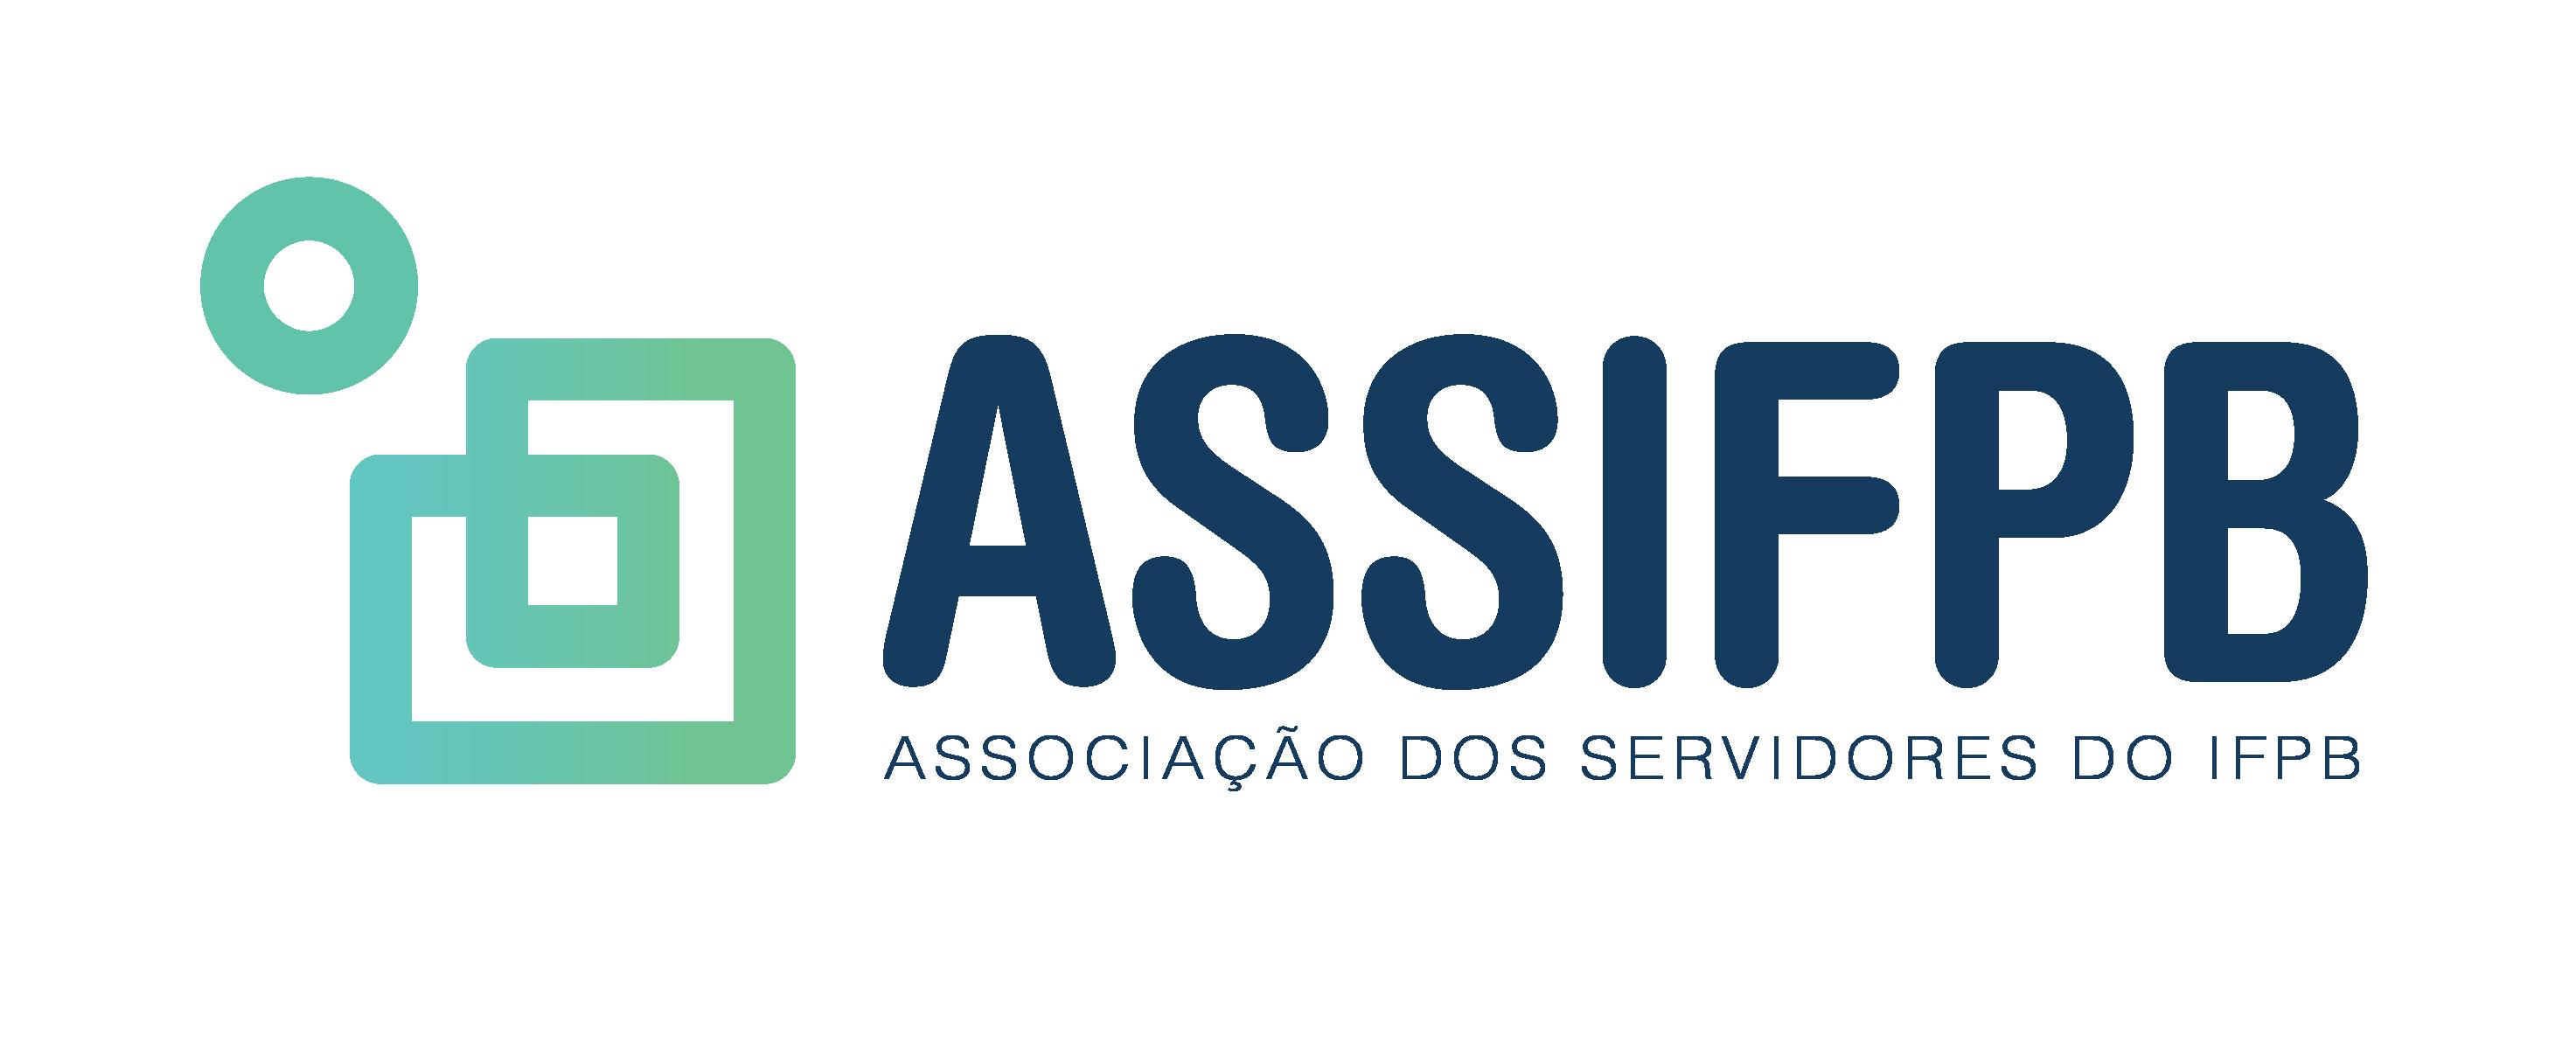 Logotipo 1